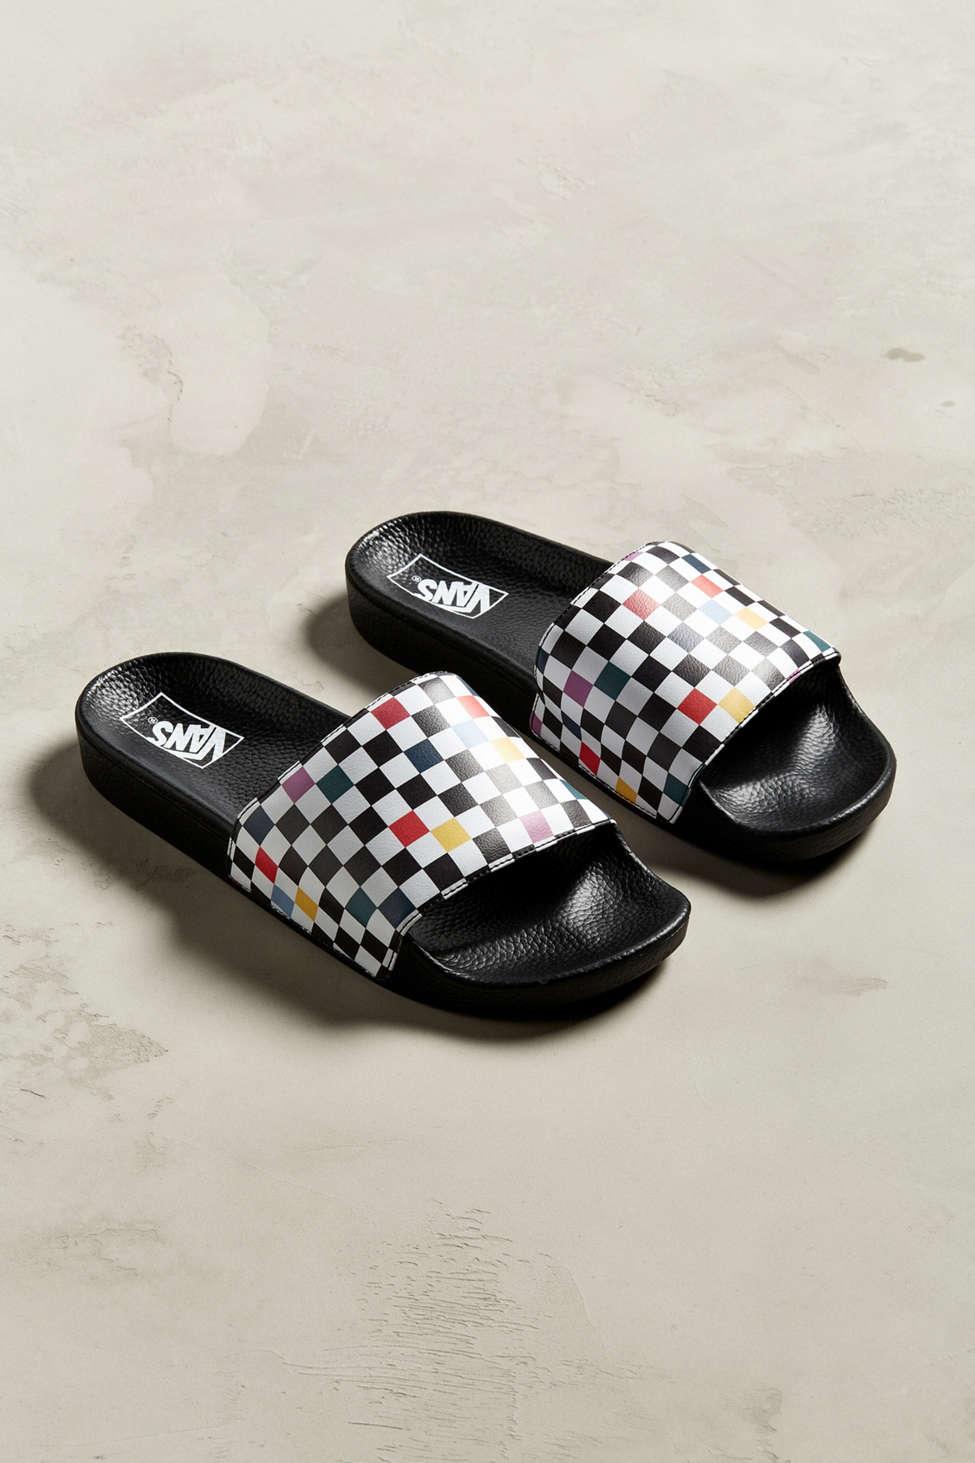 Vans Sport Slide Party Checkerboard Sandal